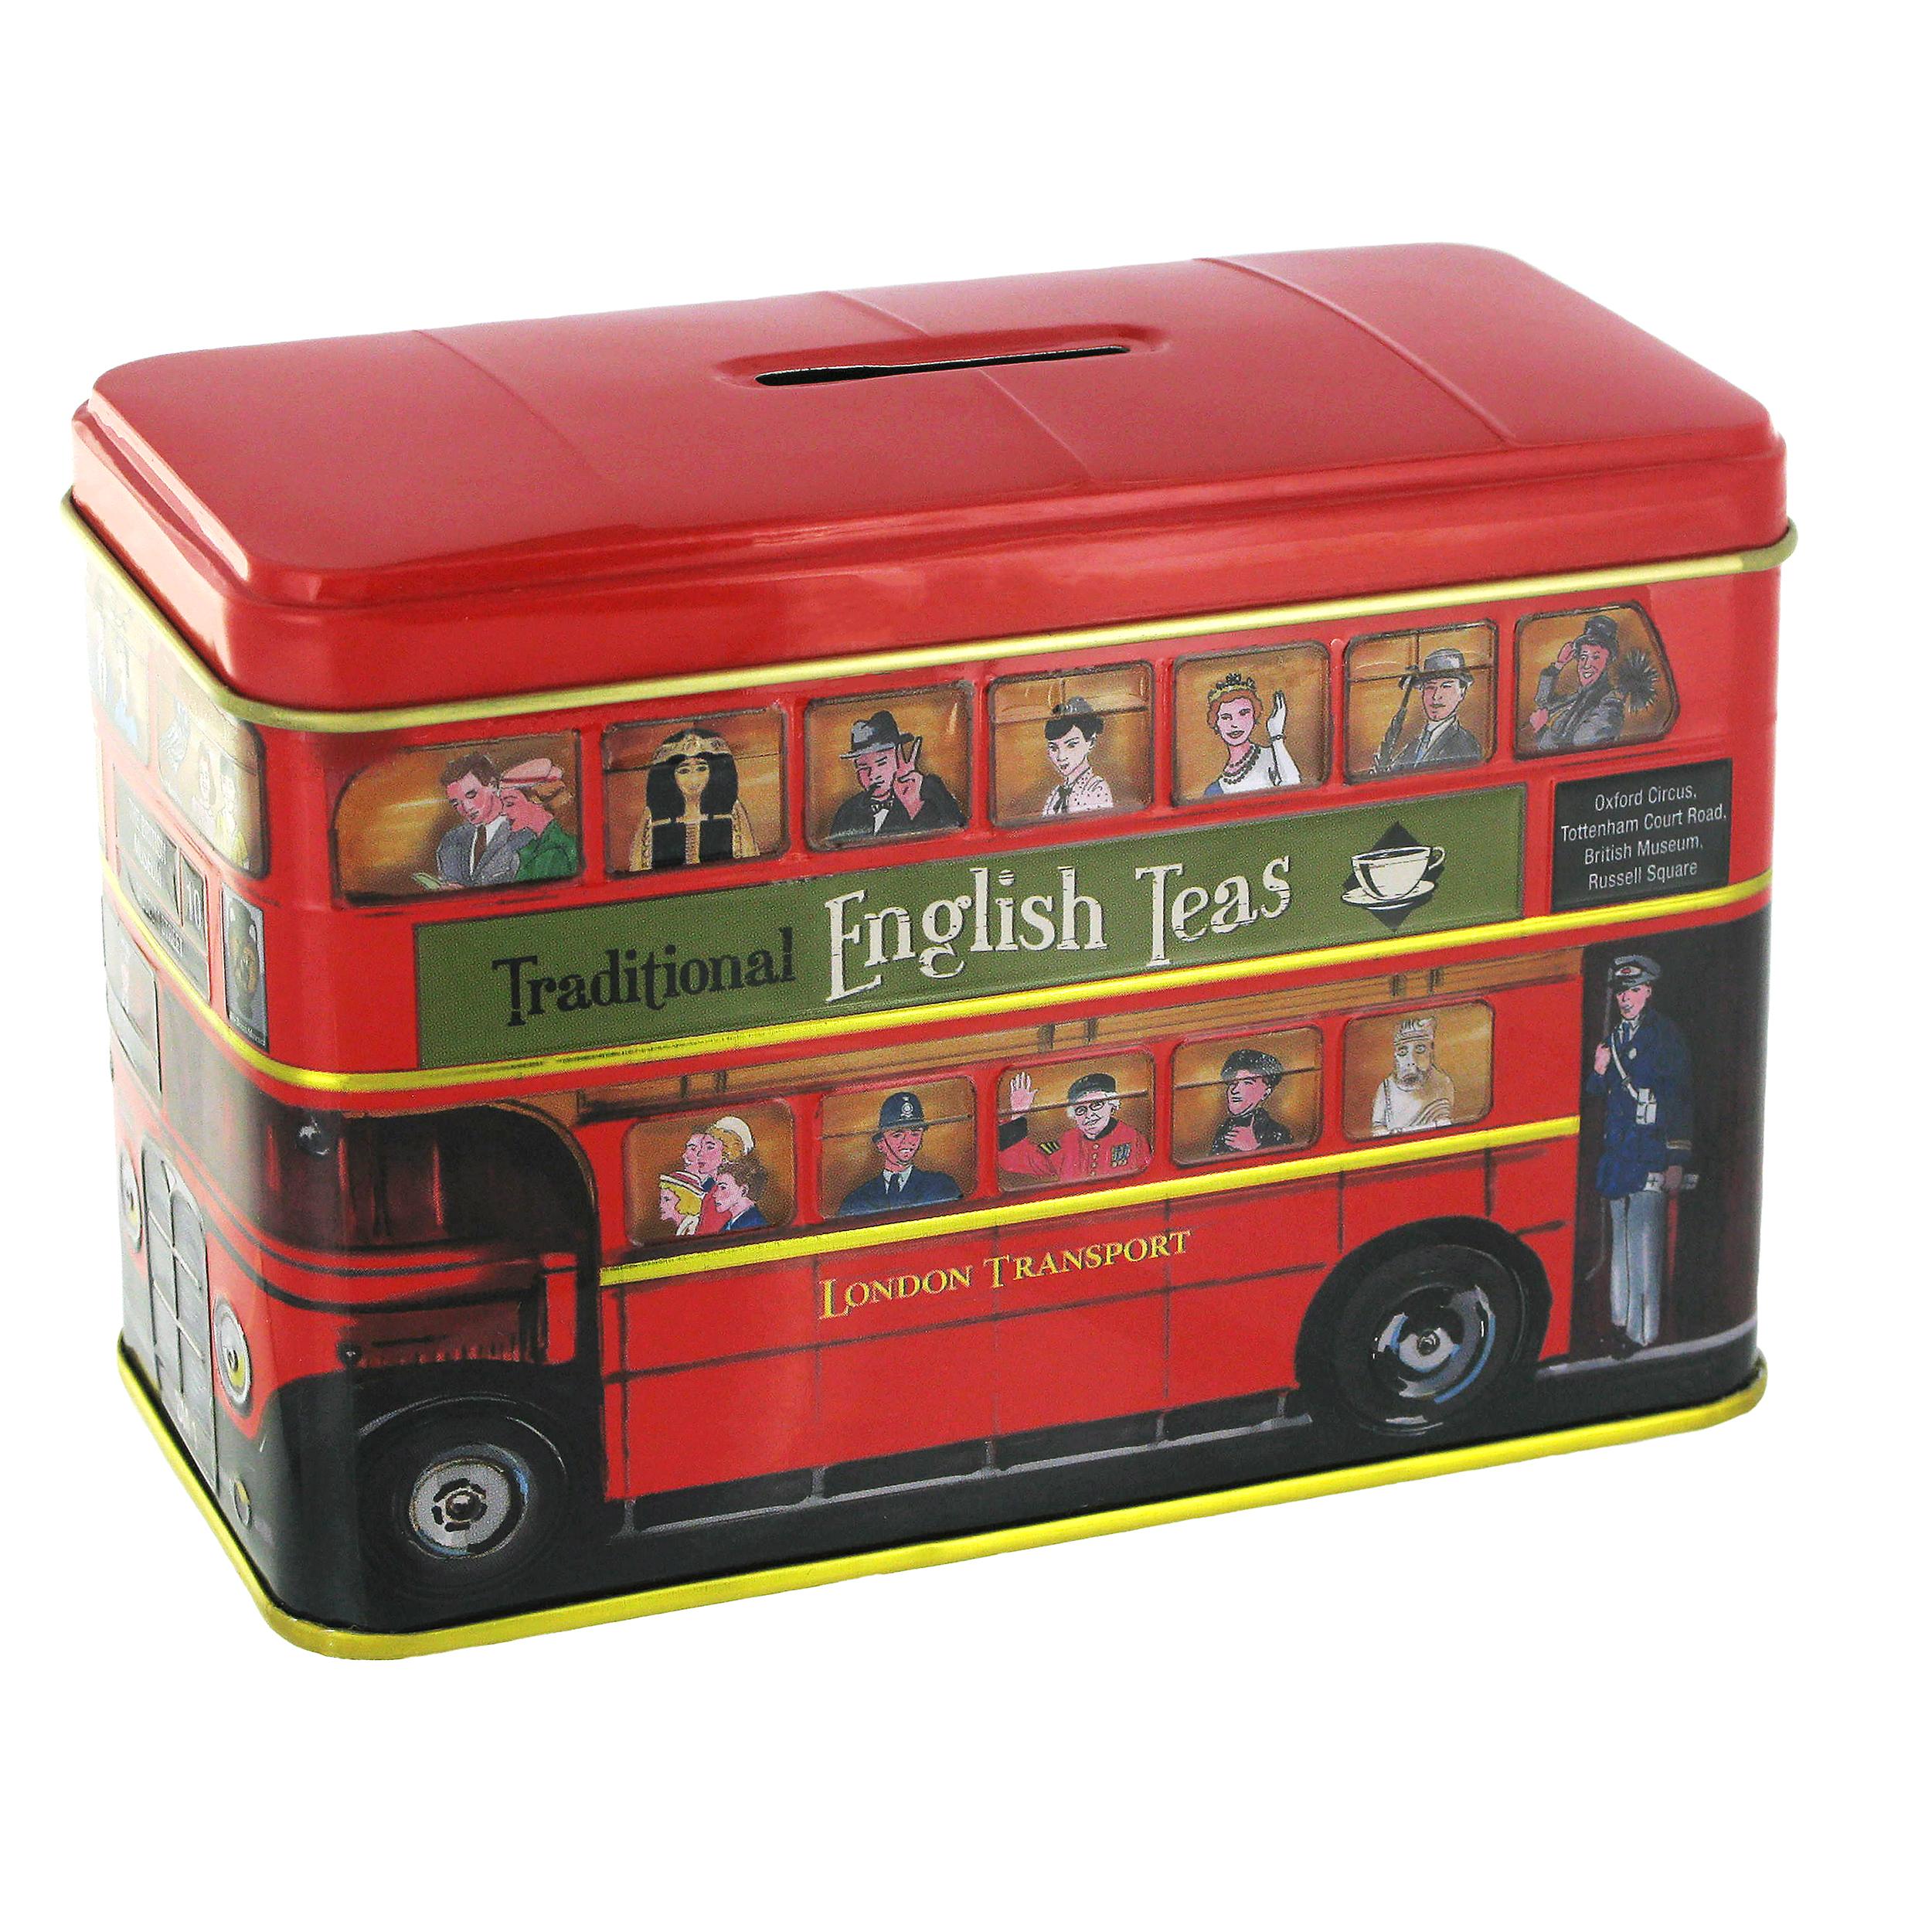 London bus caddy with English tea